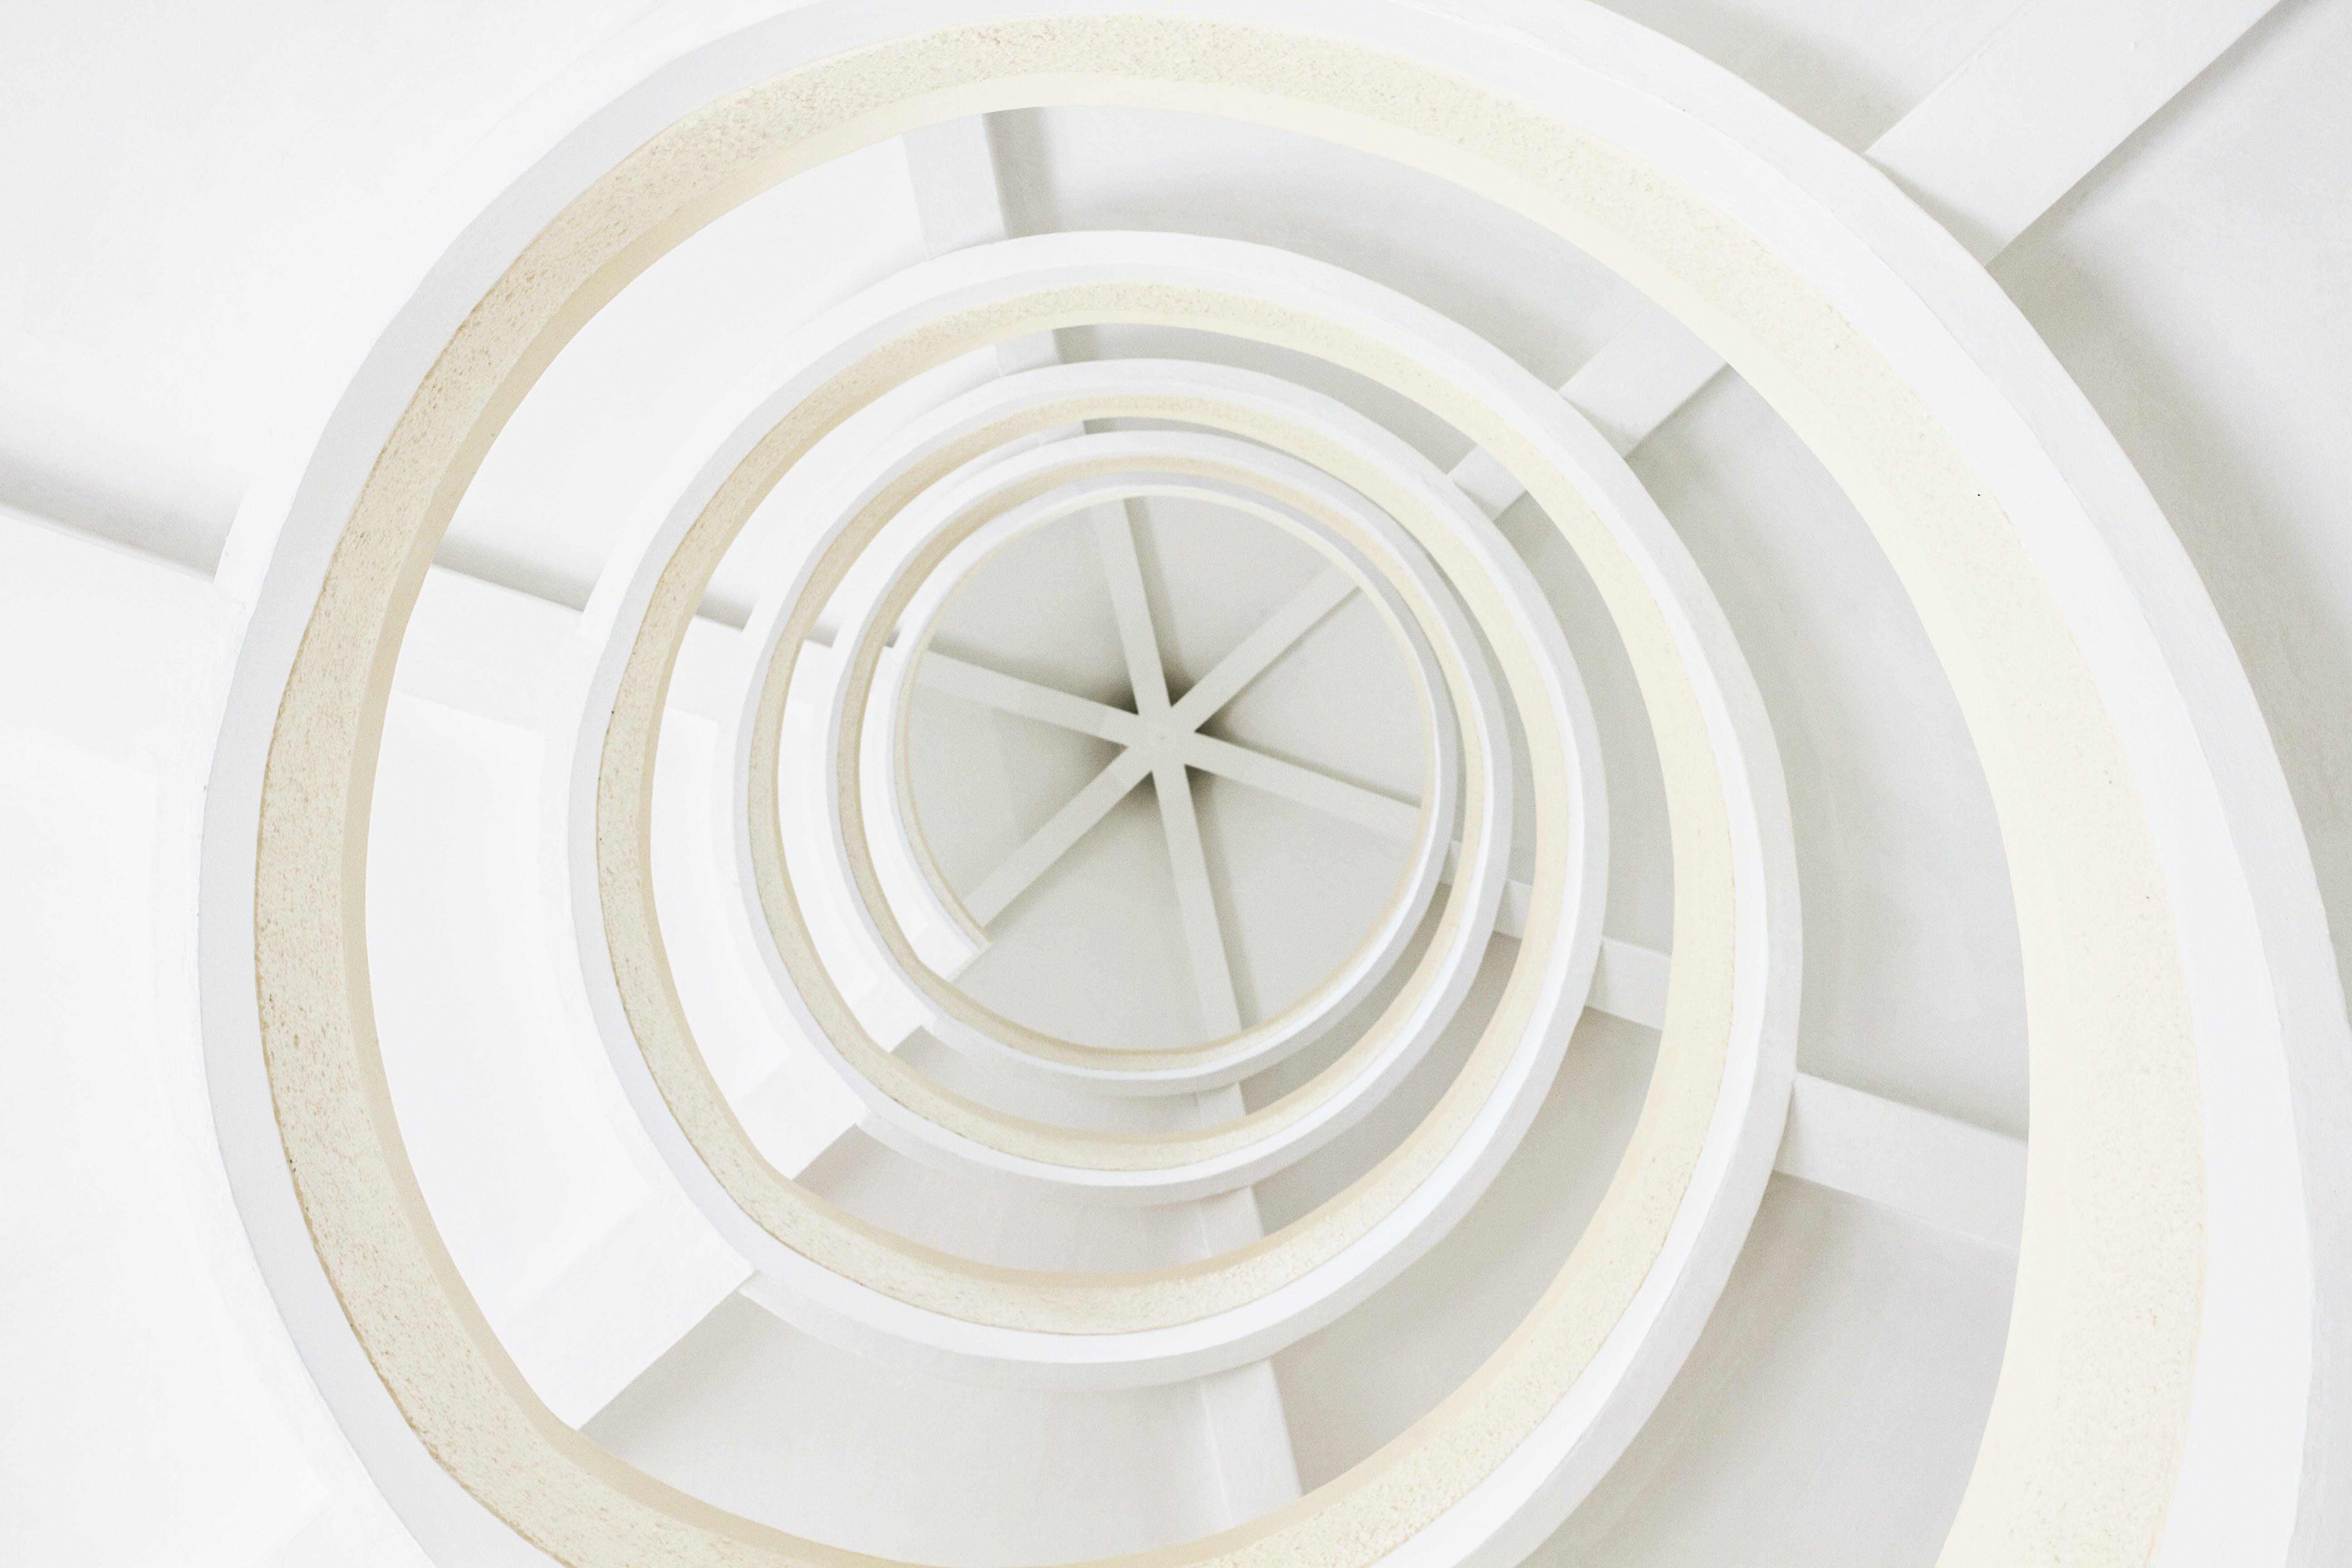 Round White Digital Wallpaper